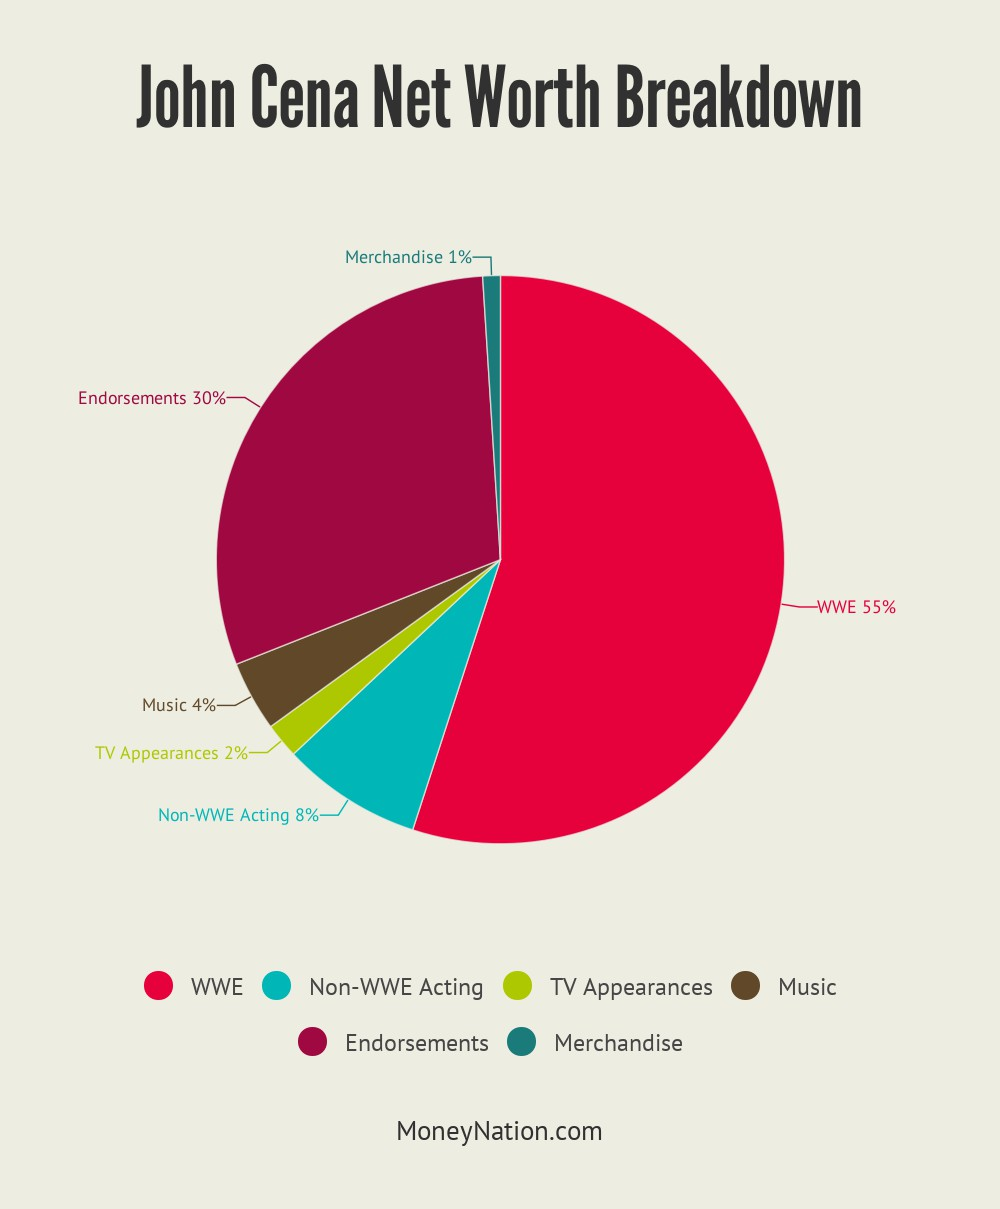 John Cena Net Worth Breakdown